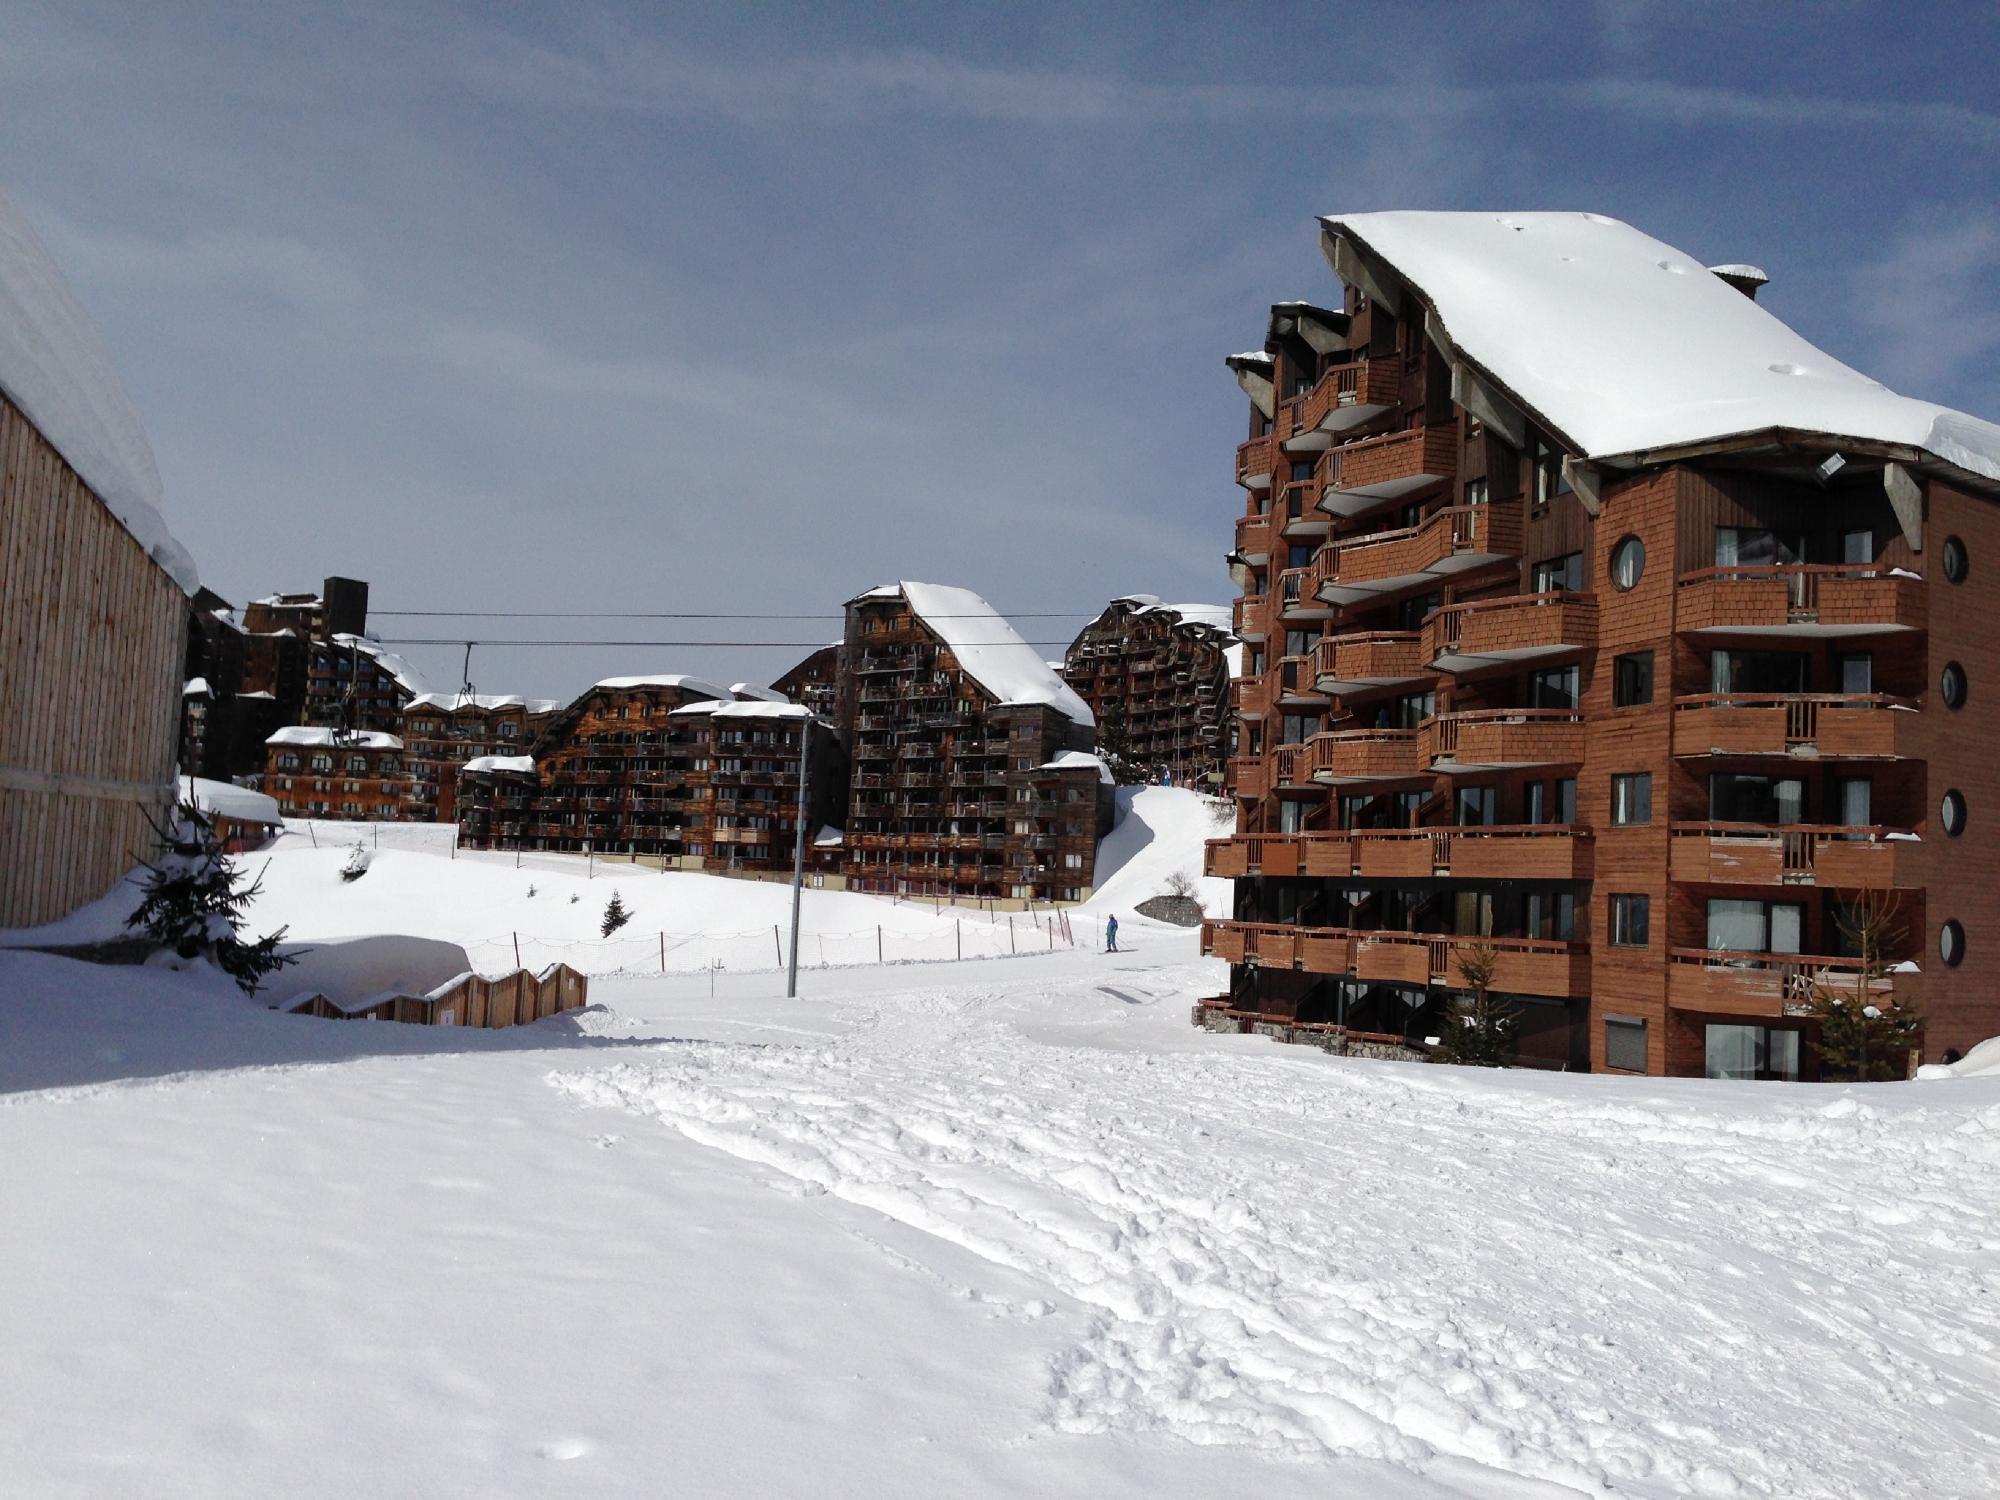 Pierre & Vacances Residence Tilia